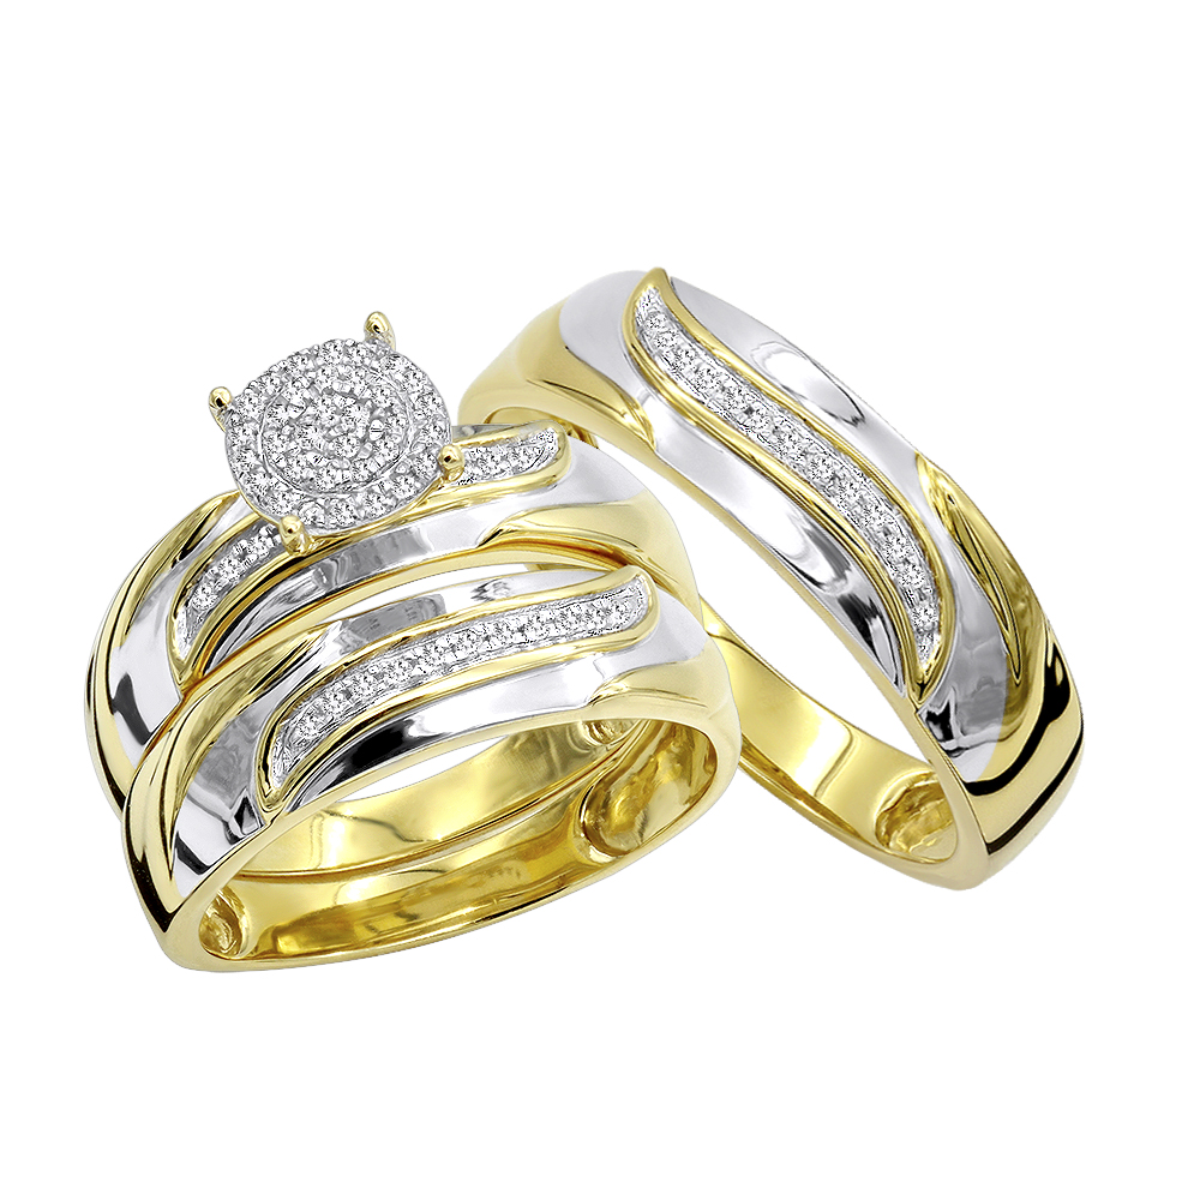 10K Gold Affordable Diamond Engagement Ring Wedding Bang Trio Set 0.2ct